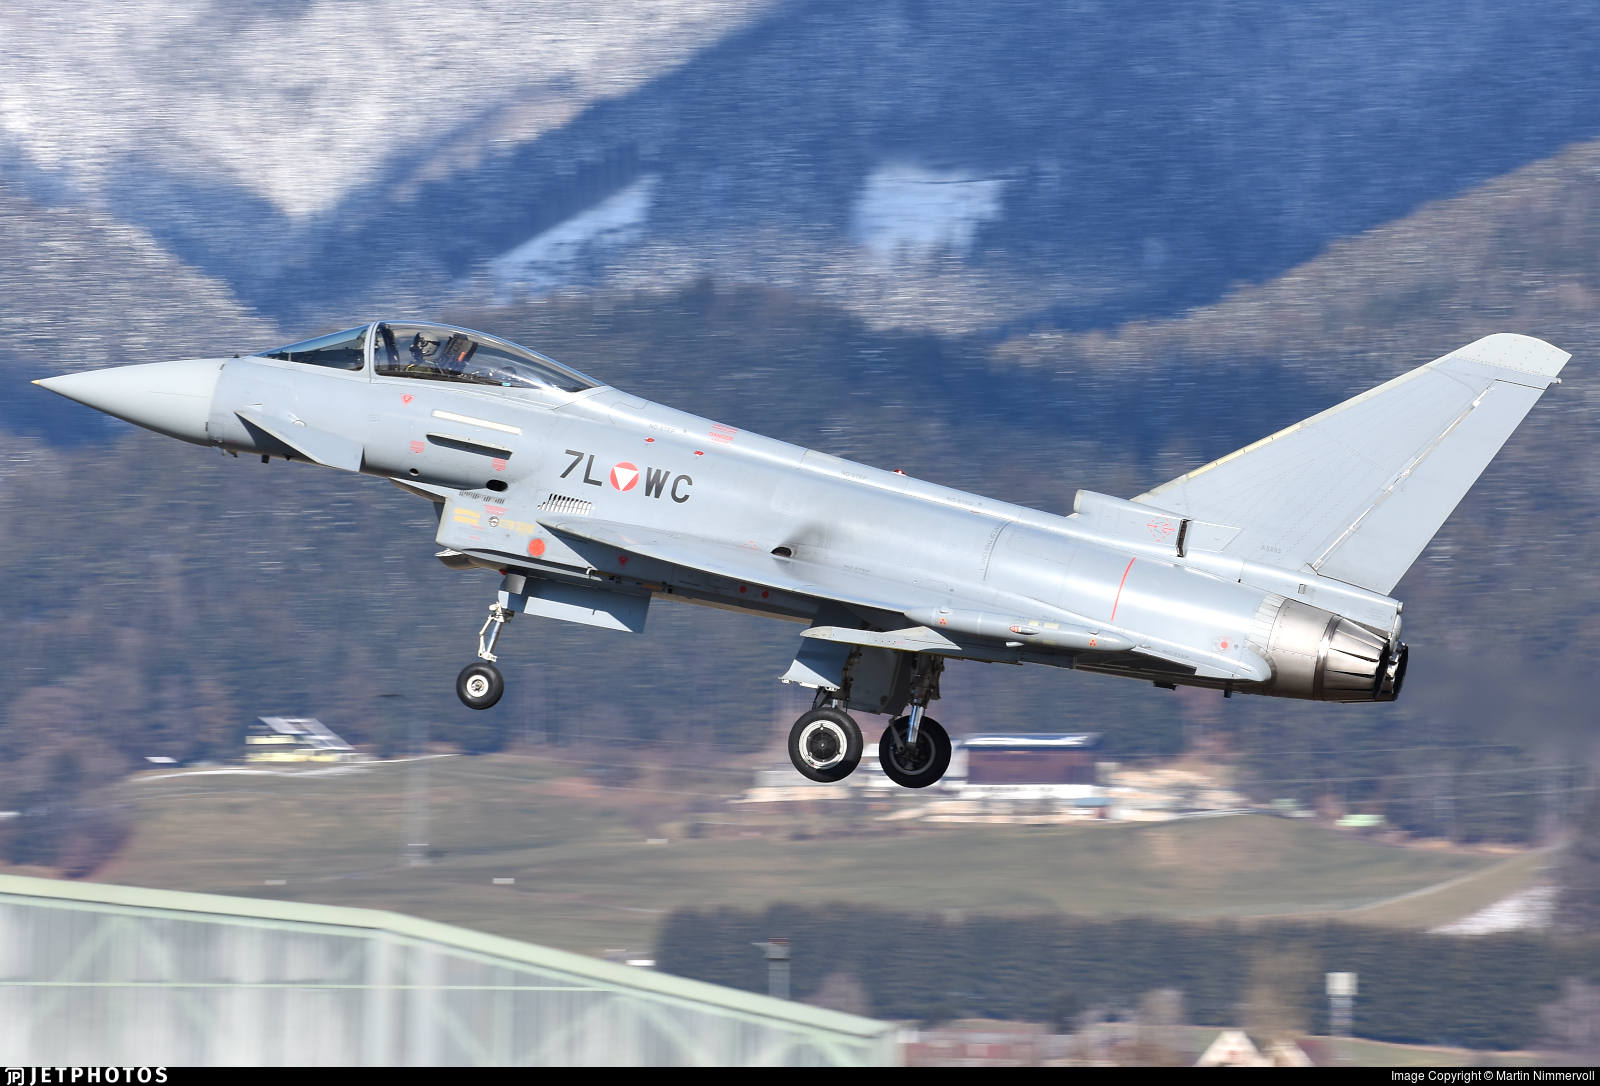 7L-WC - Eurofighter Typhoon EF2000 - Austria - Air Force